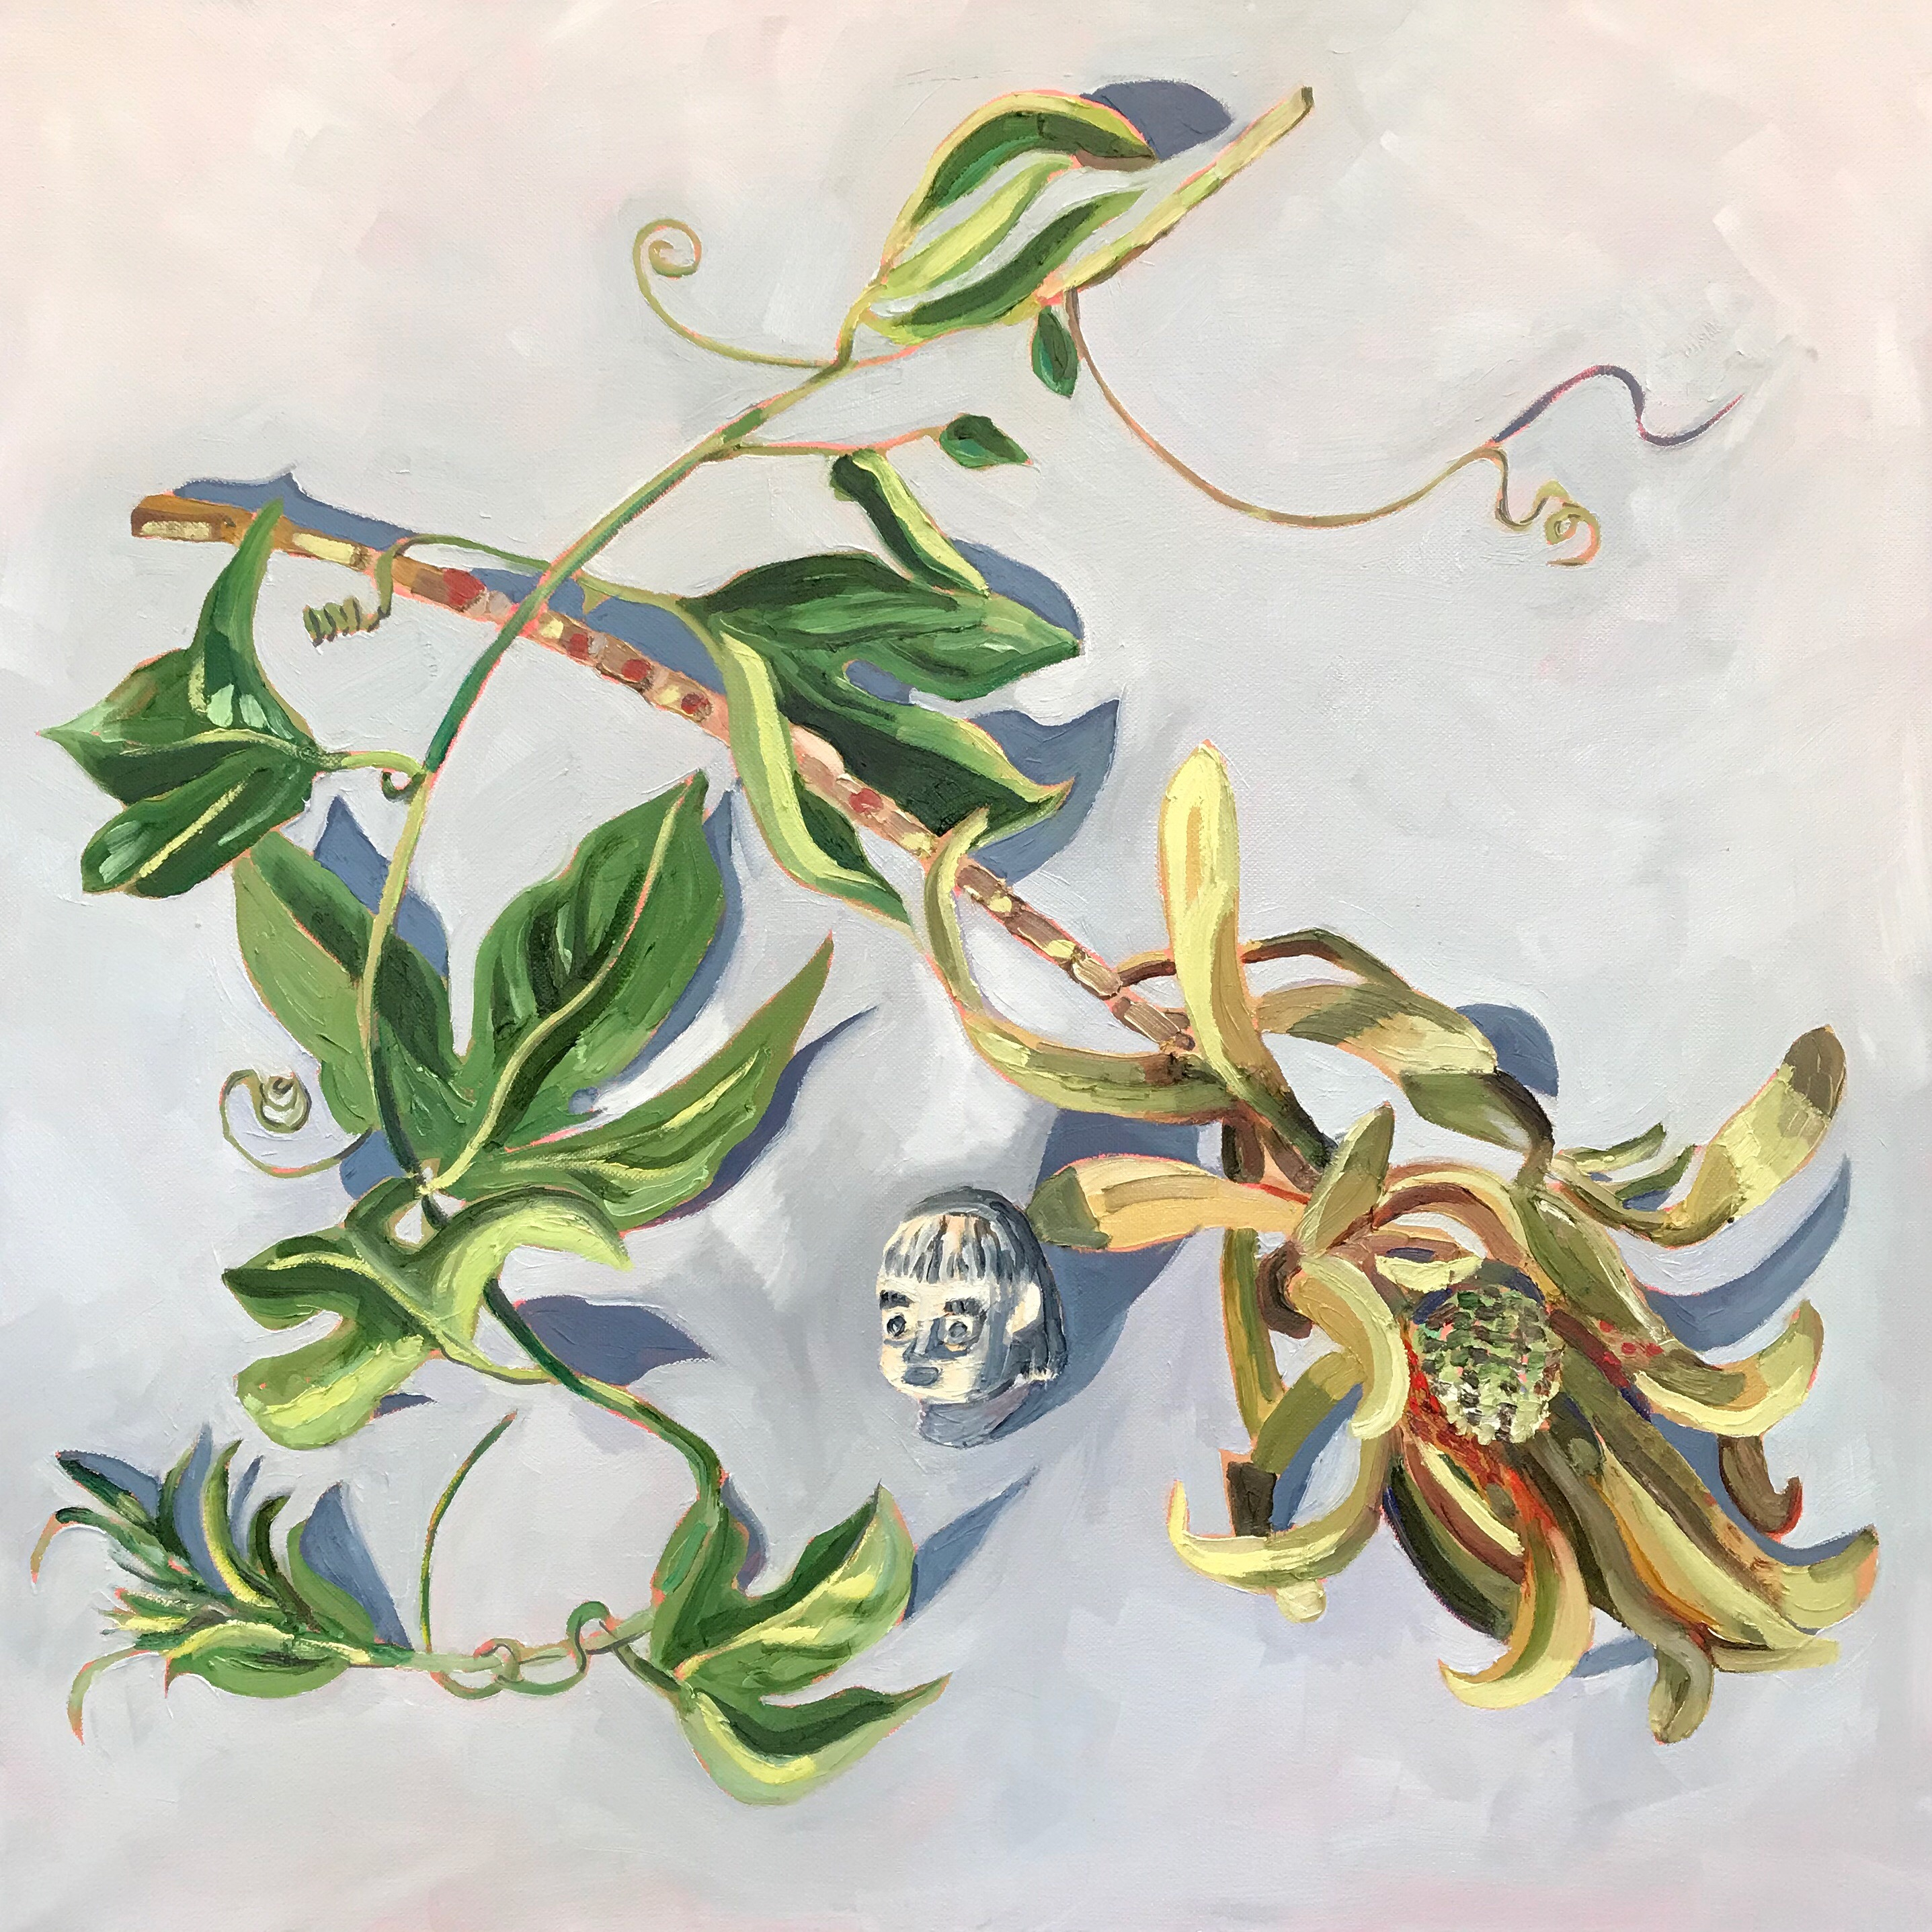 Passion Vine and Dried Protea